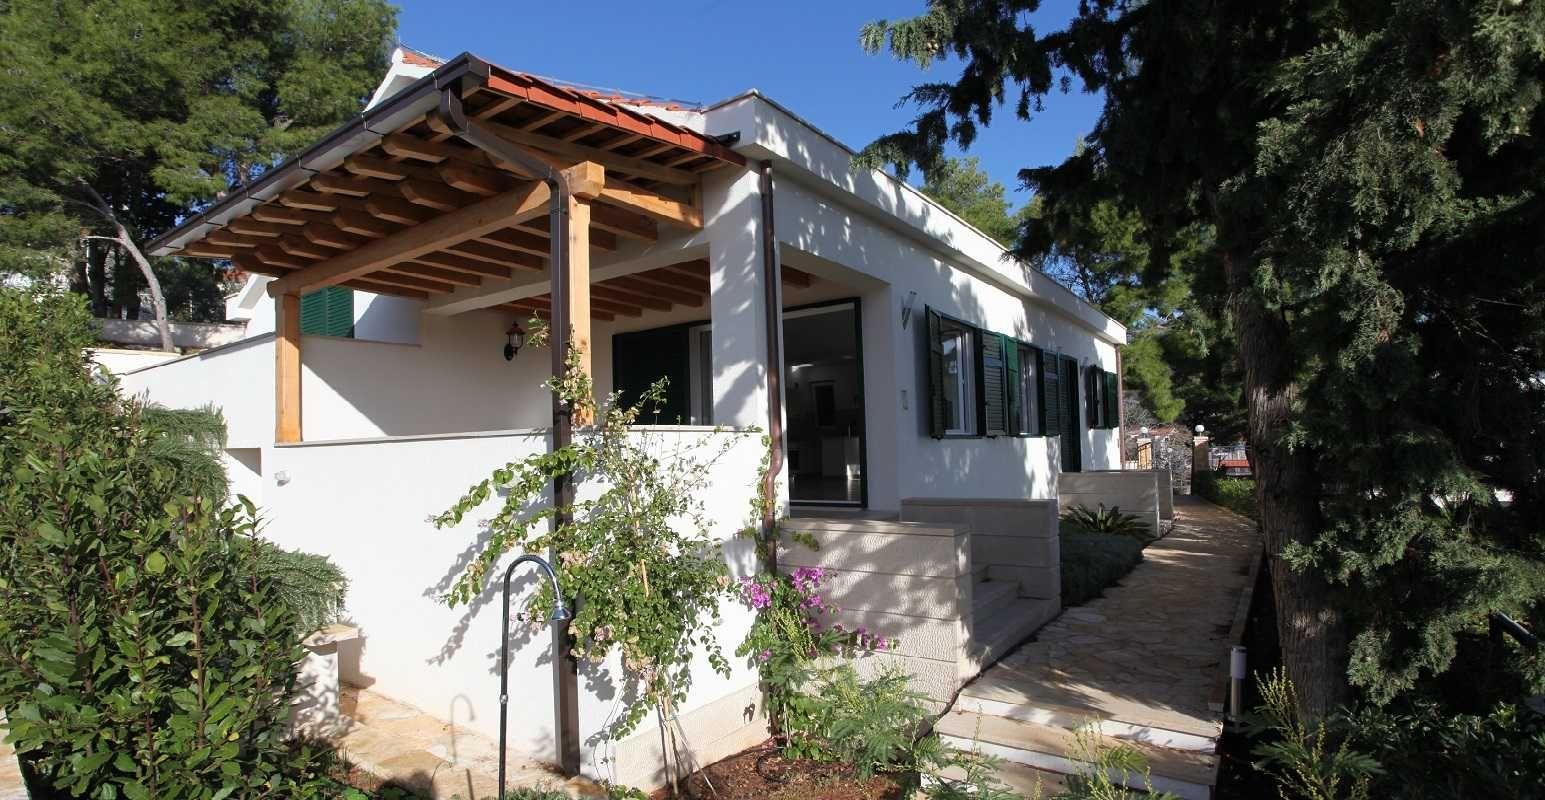 Villas Dalmatia Croatia Peaceful Holiday Home in Brac